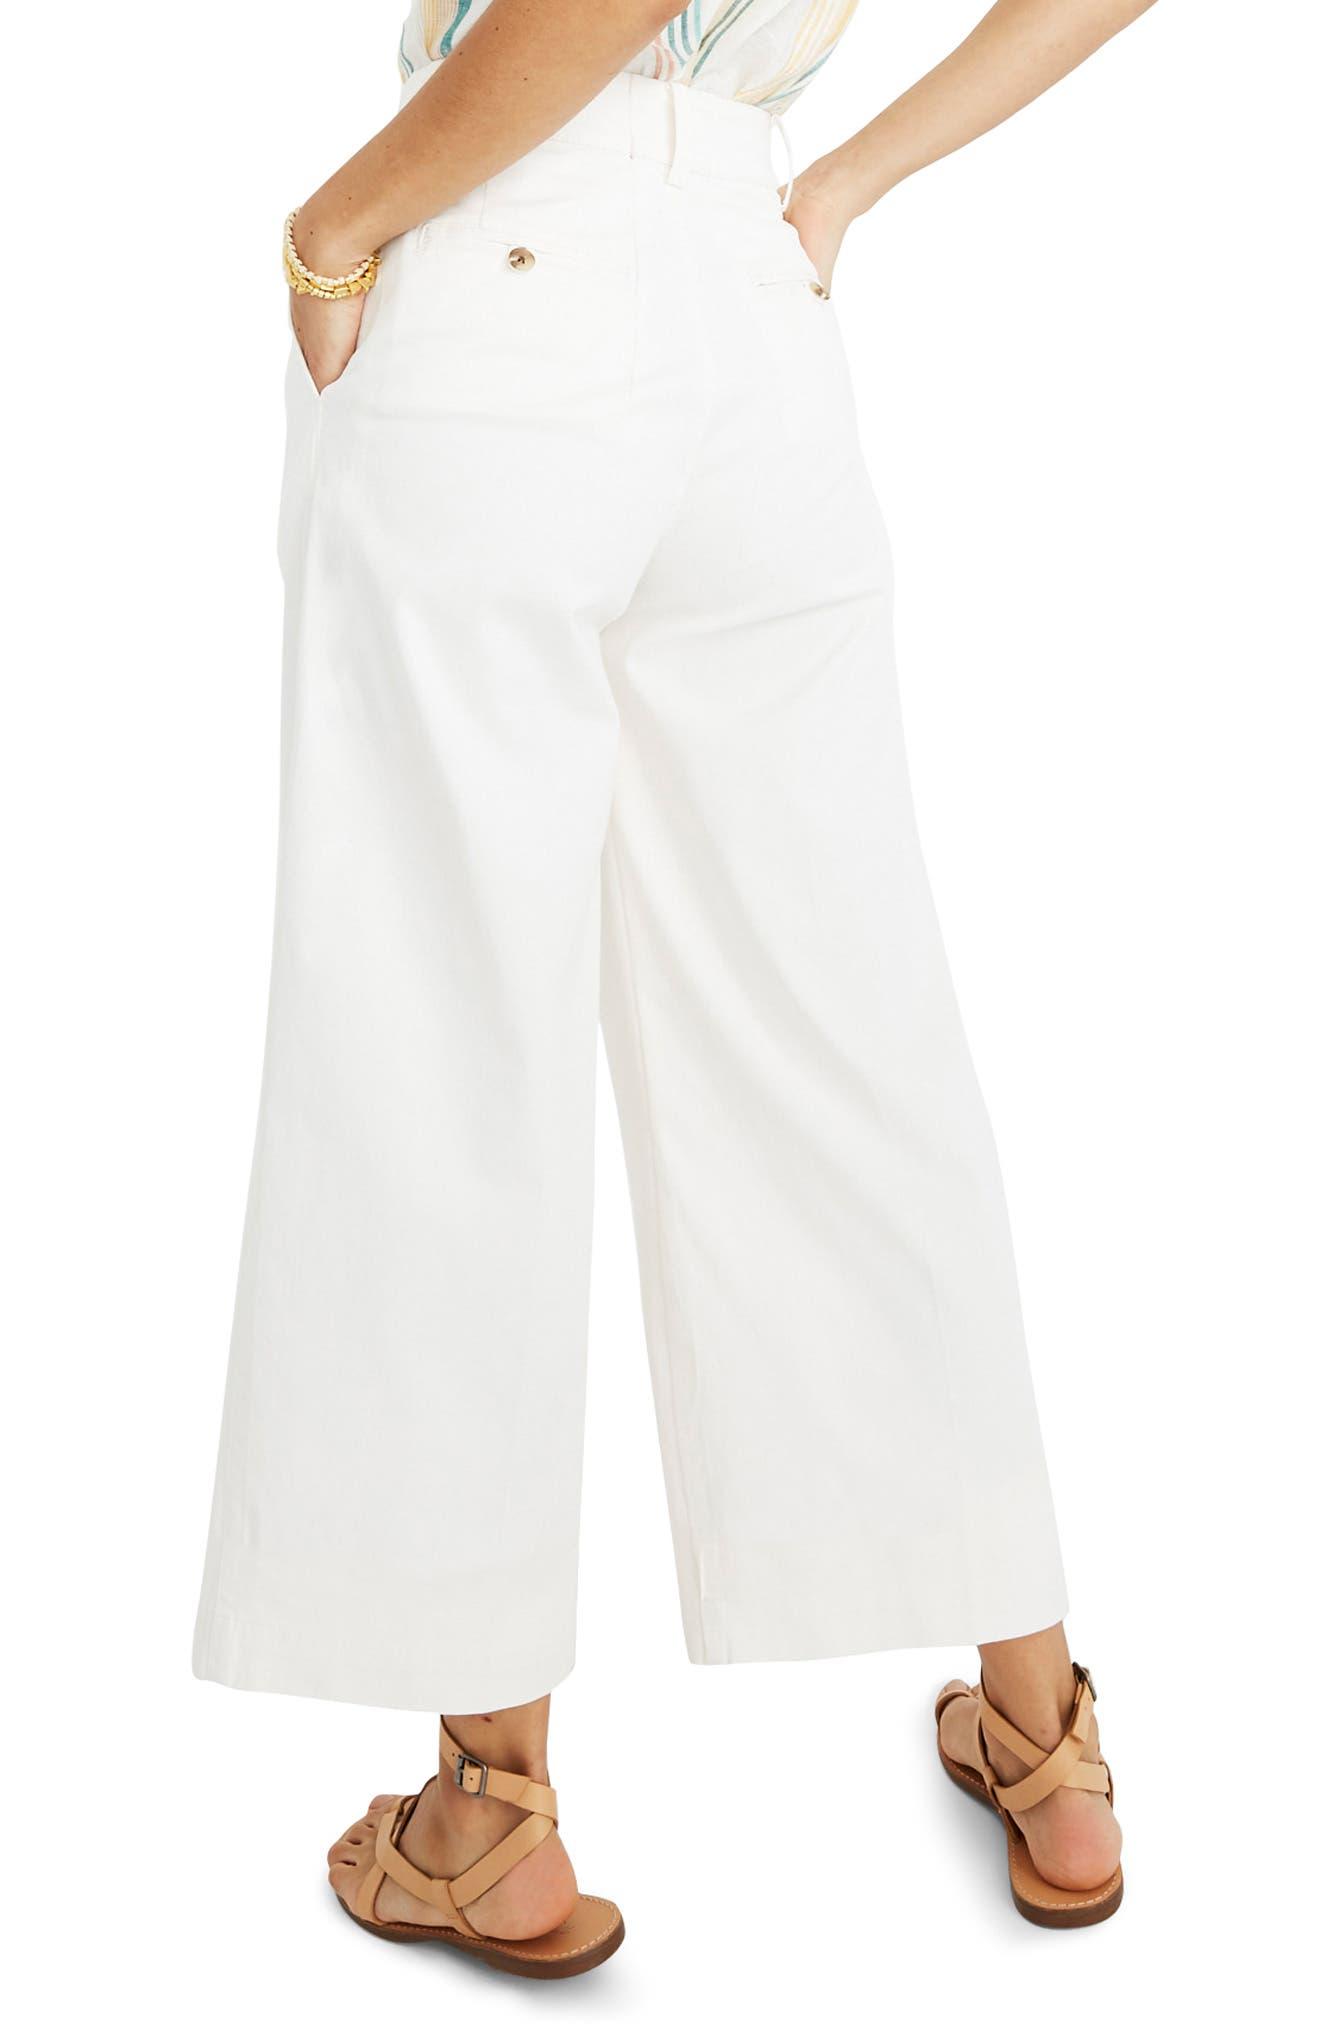 MADEWELL, High Waist Crop Wide Leg Pants, Alternate thumbnail 2, color, LIGHTHOUSE